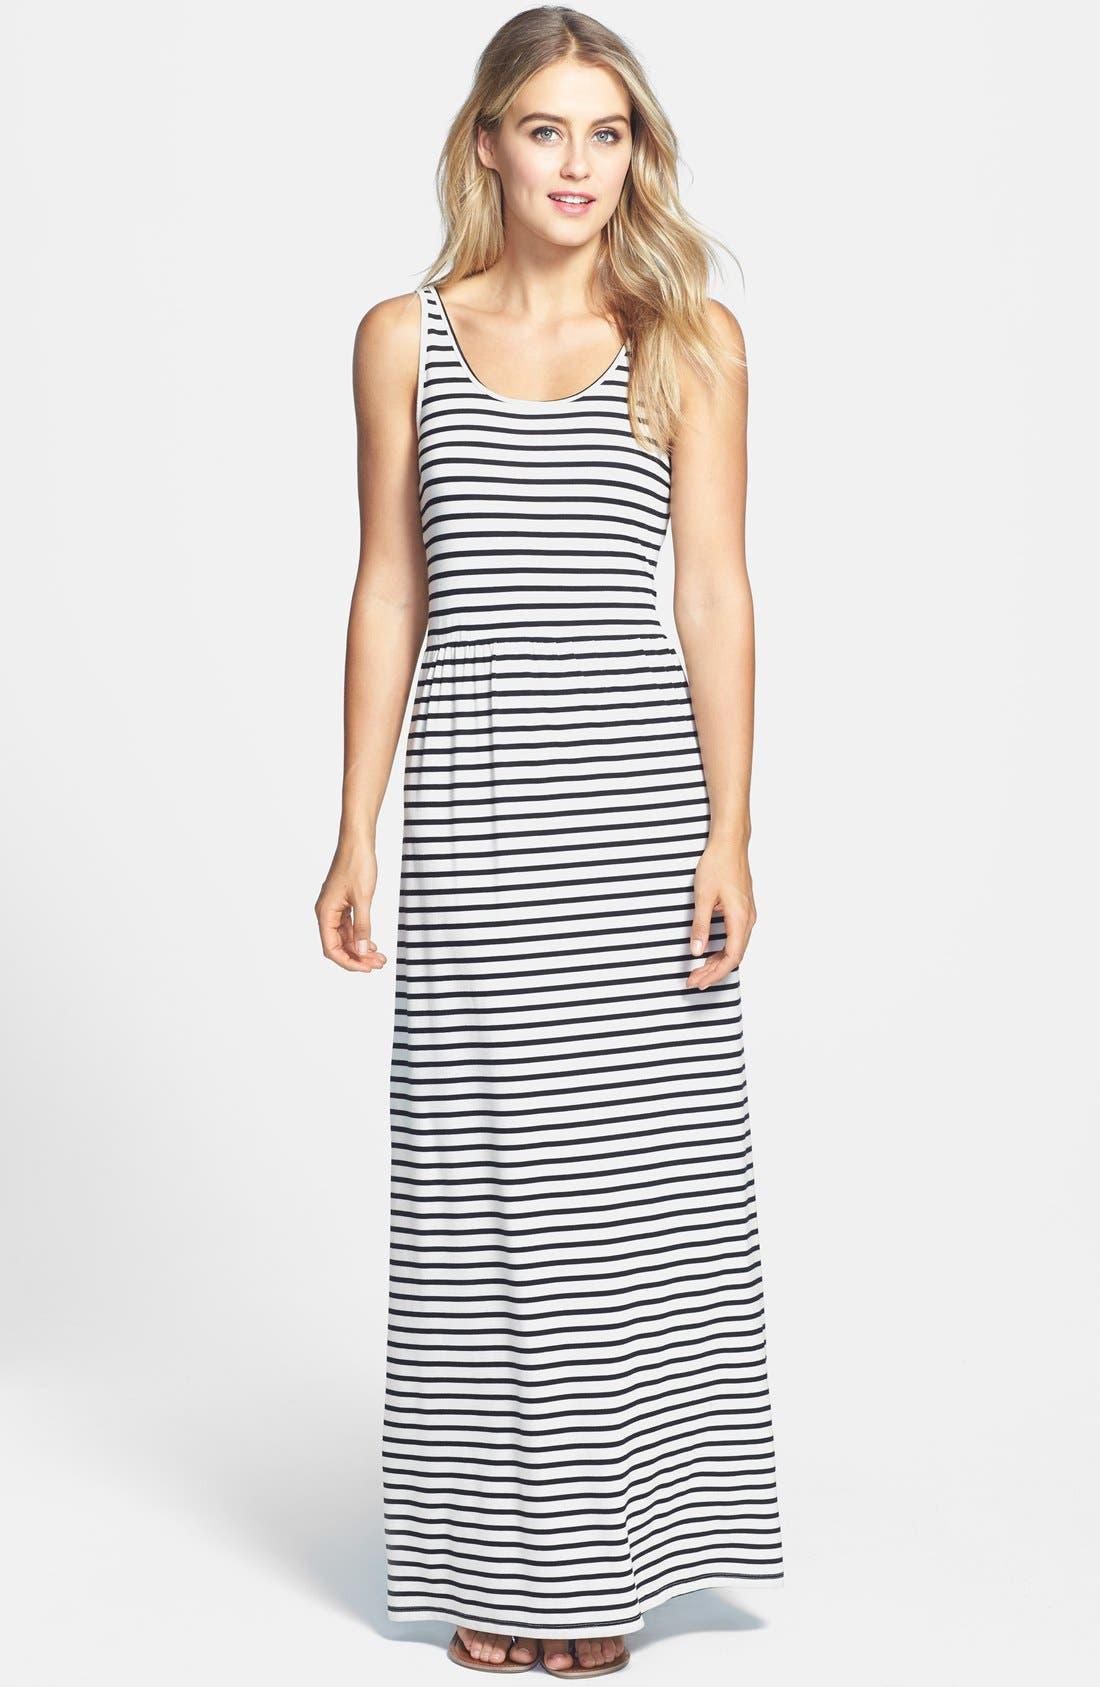 Main Image - Two by Vince Camuto 'Rising Stripe' Back Cutout Sleeveless Maxi Dress